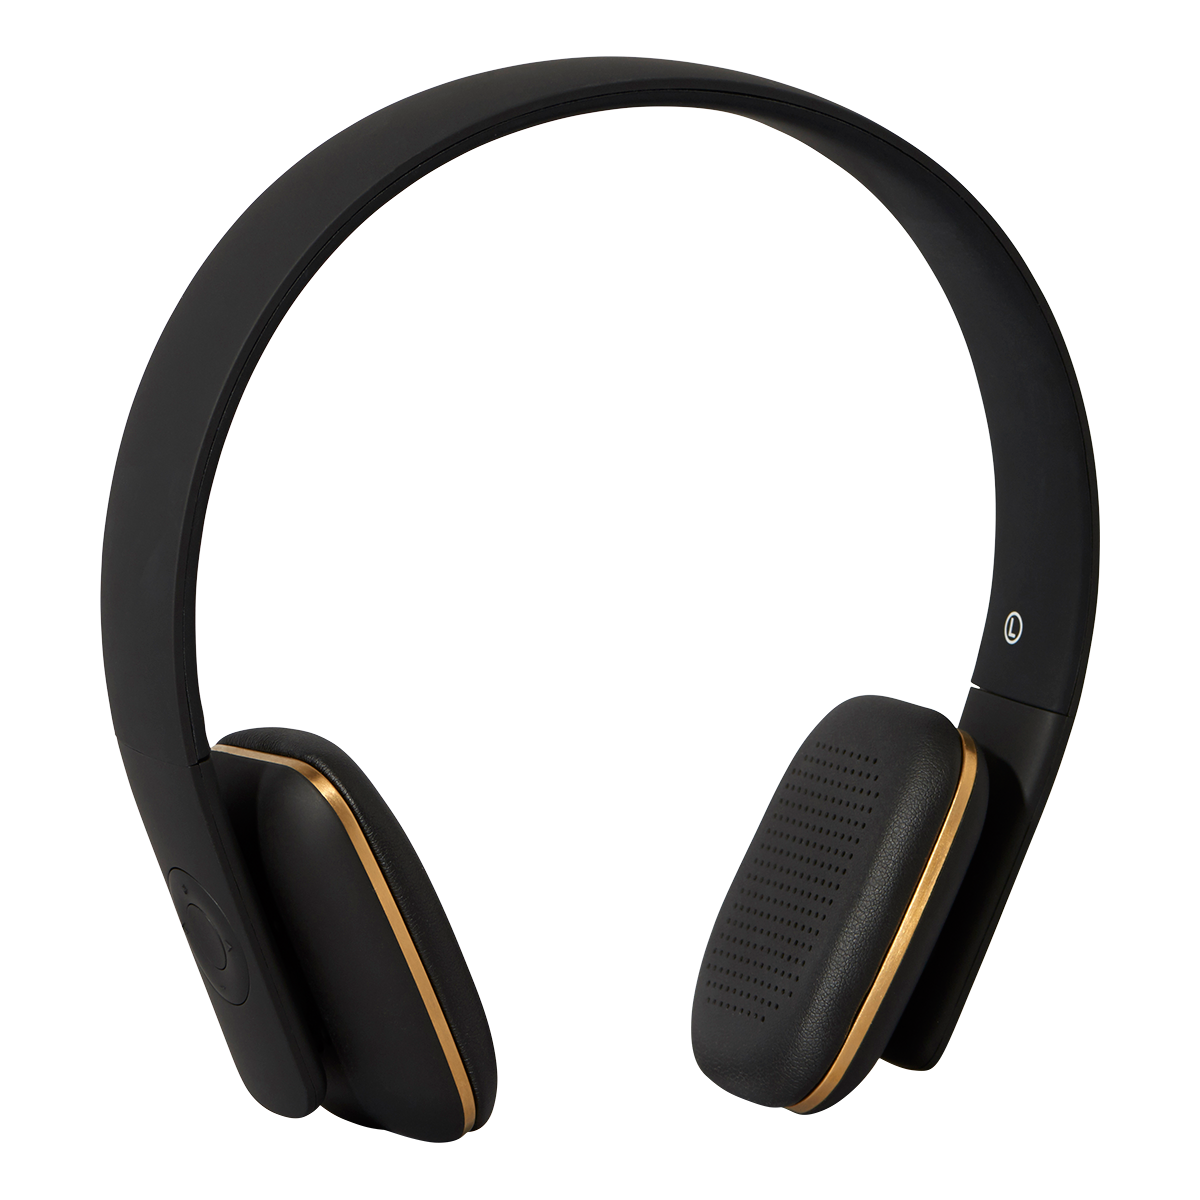 KreaFunk - aHead Headset - Black (kfss02)